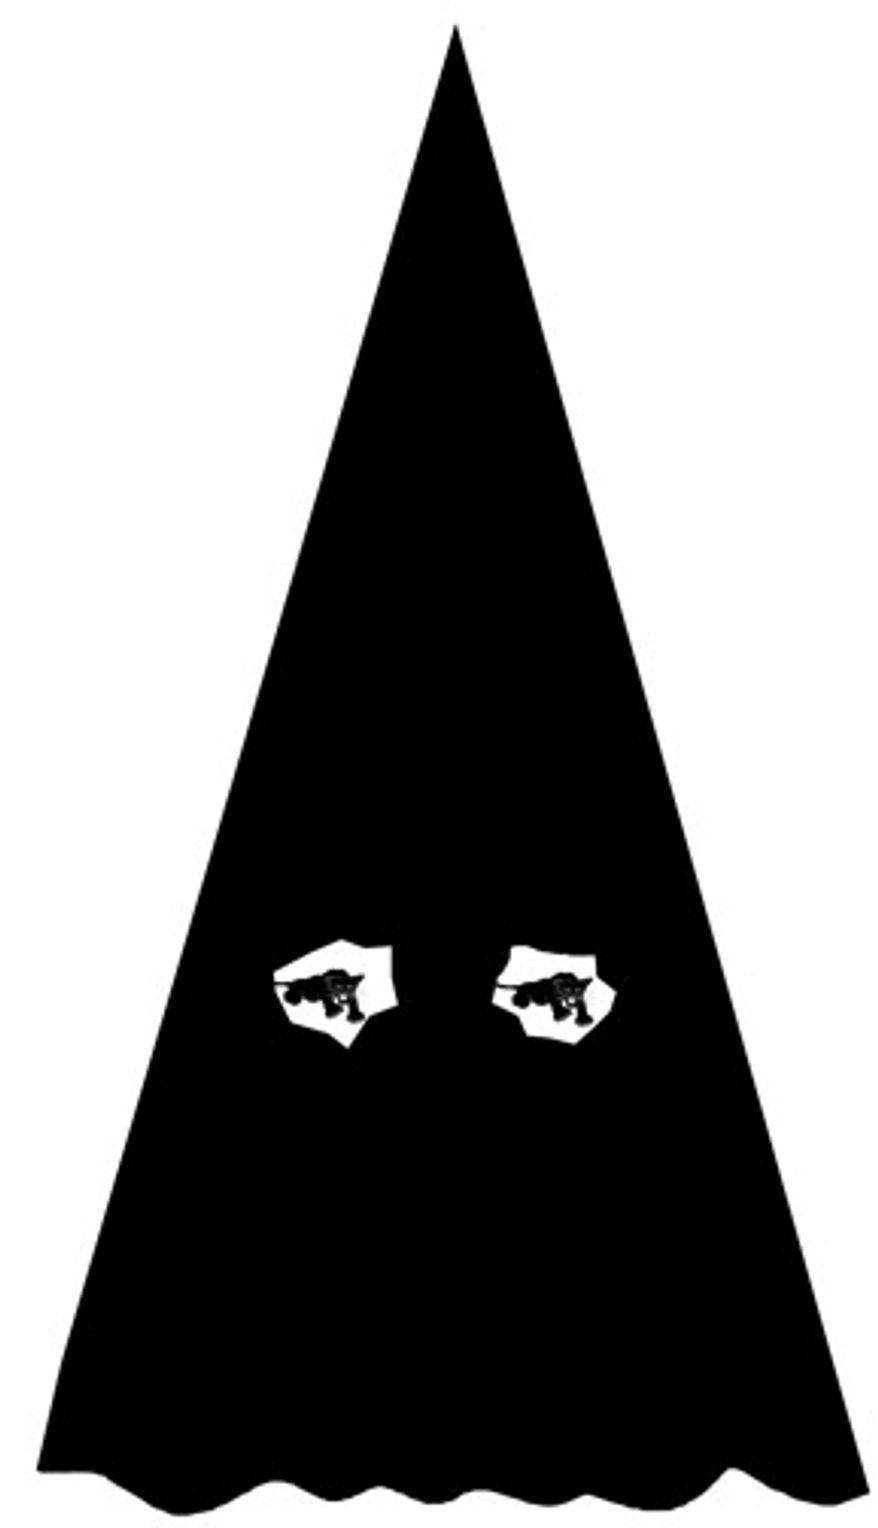 Illustration: Black Panther Klan by Alexander Hunter for The Washington Times